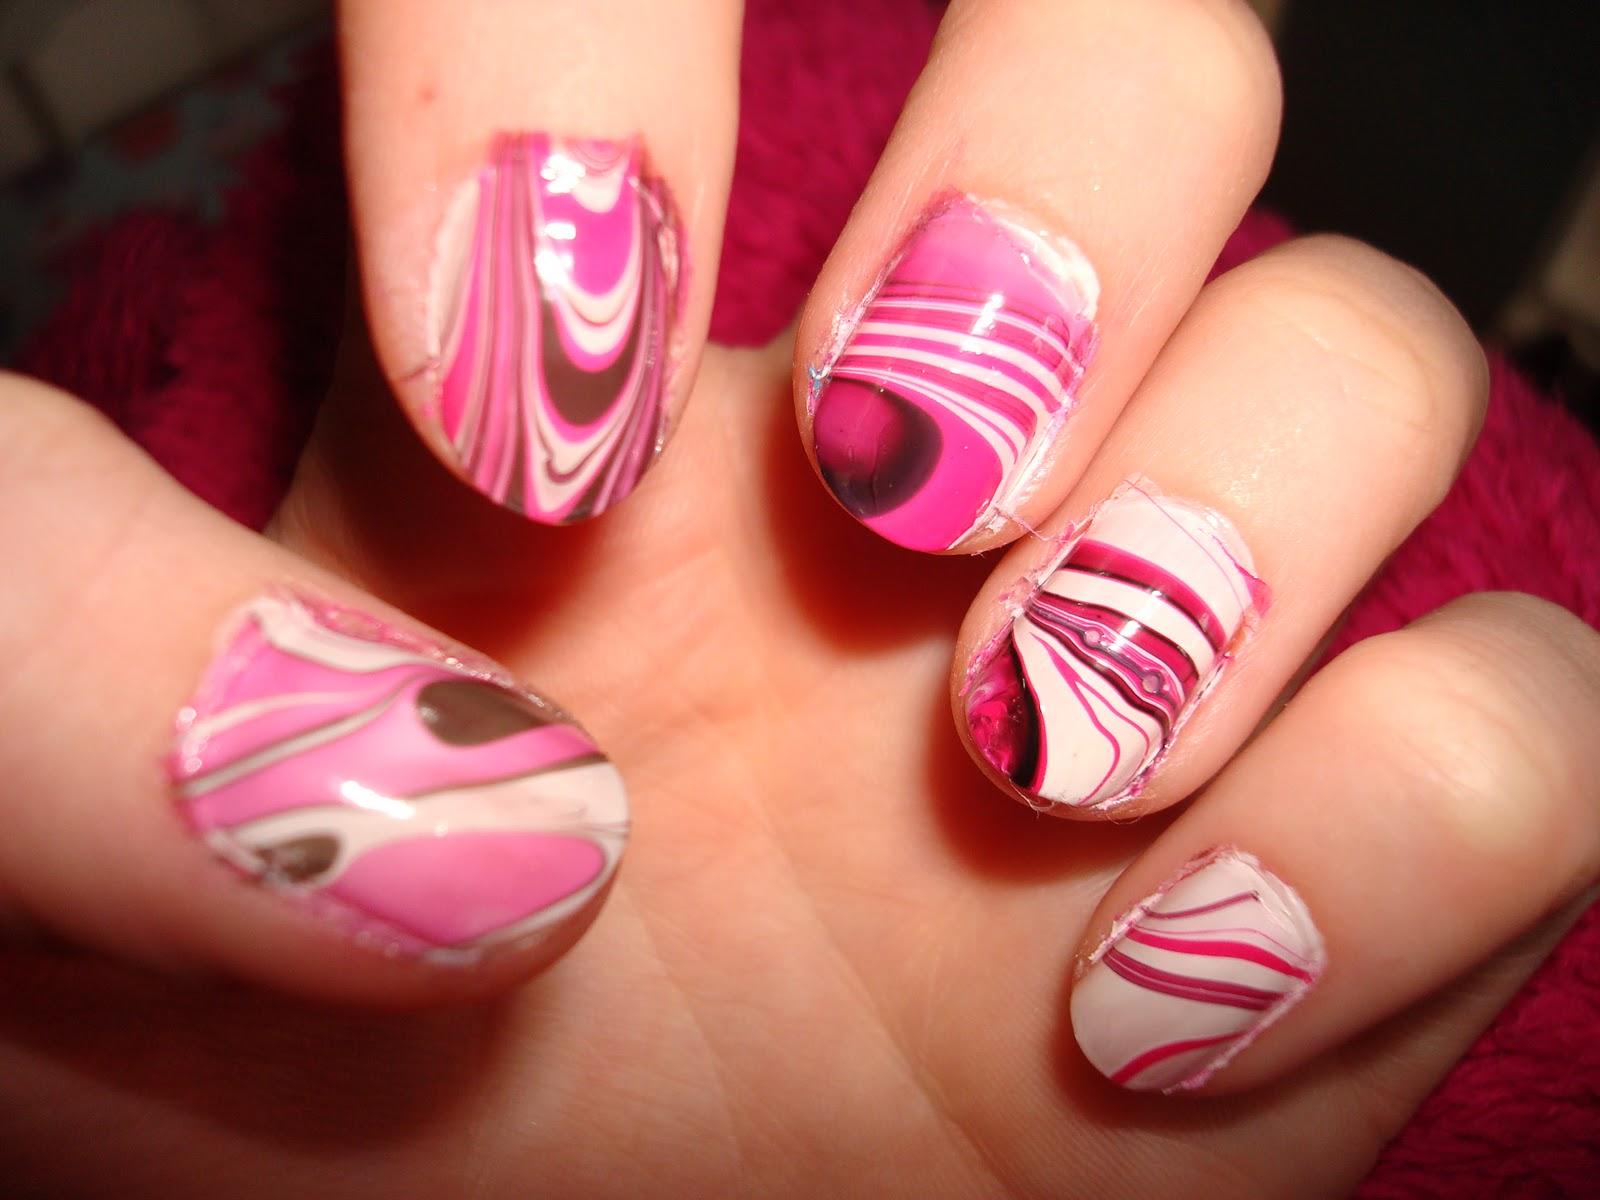 House of Bricks: Marble Nails